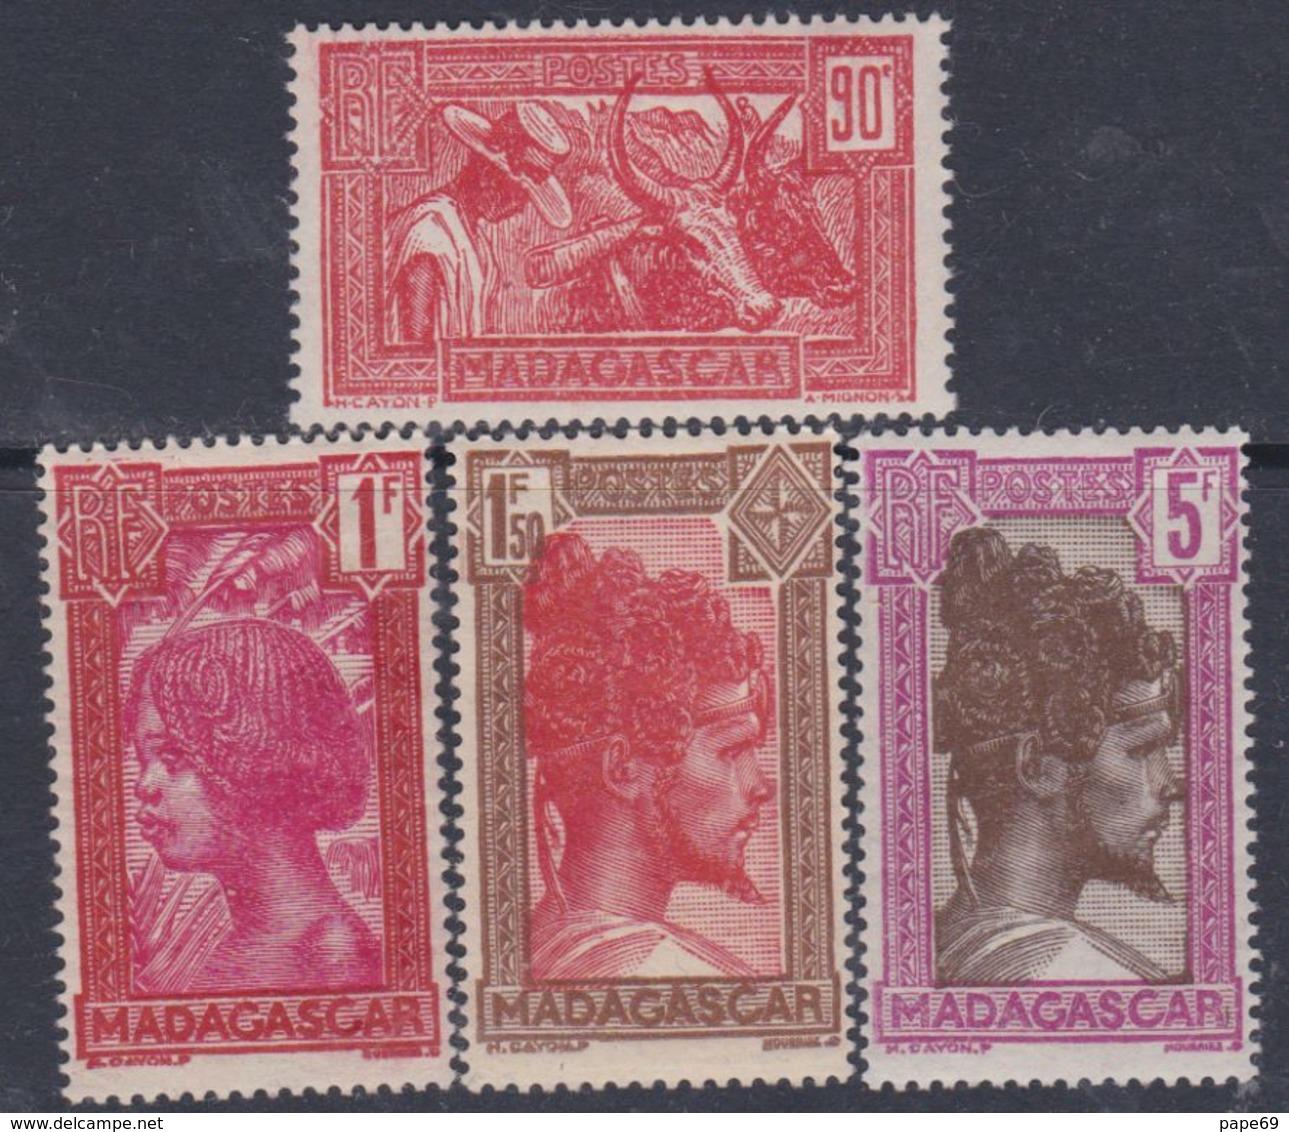 Madagascar N° 174 +175A +176A  + 177 XX Partie Série Chef Sakalave  : Les 4 Vals Ss Cha., Gomme Tropicale   Sinon TB - Madagascar (1889-1960)